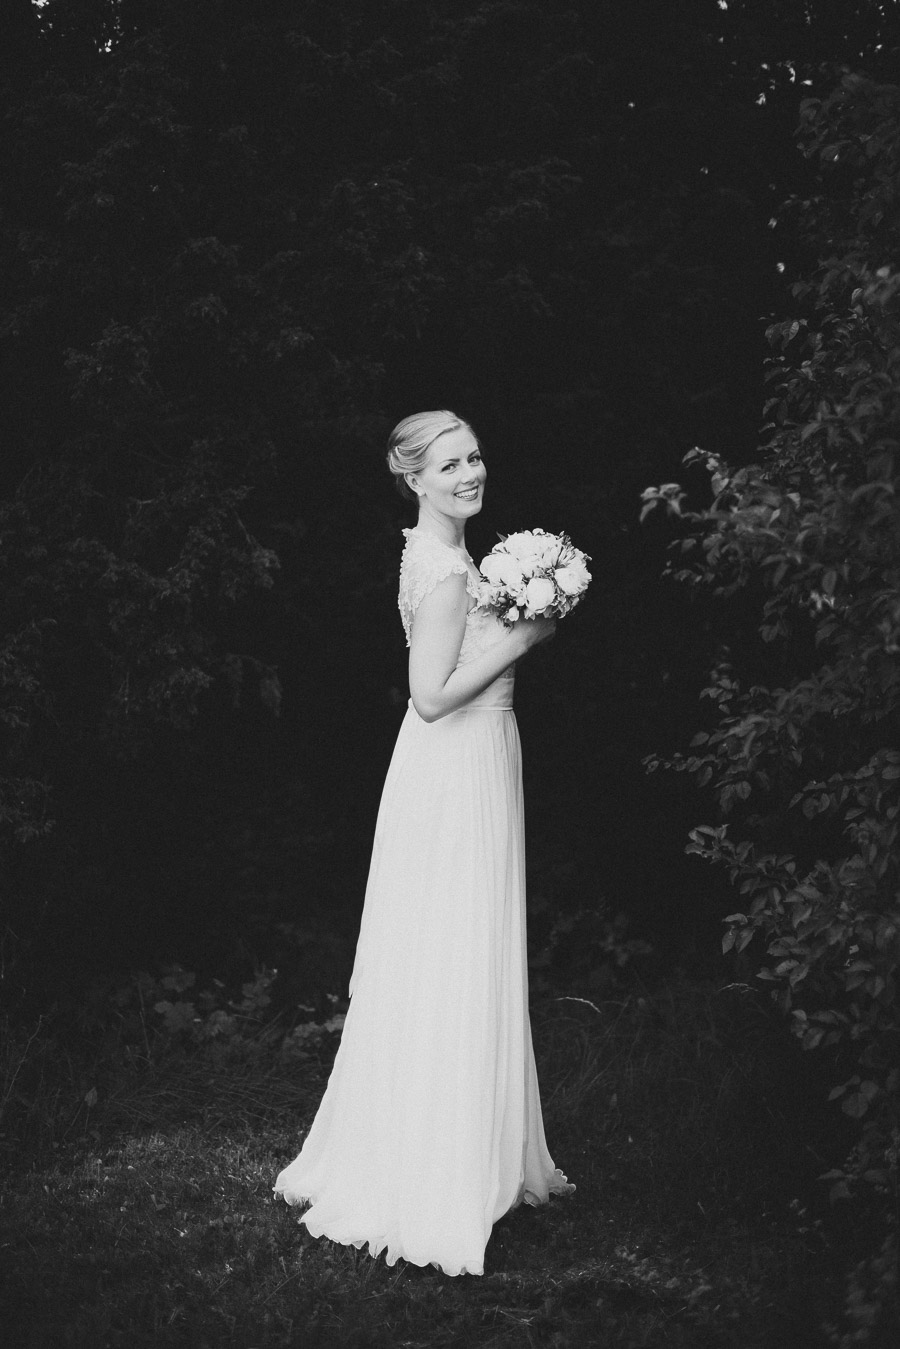 Best_wedding_photos_moments_2014_mait_juriado_M&J-Studios-033